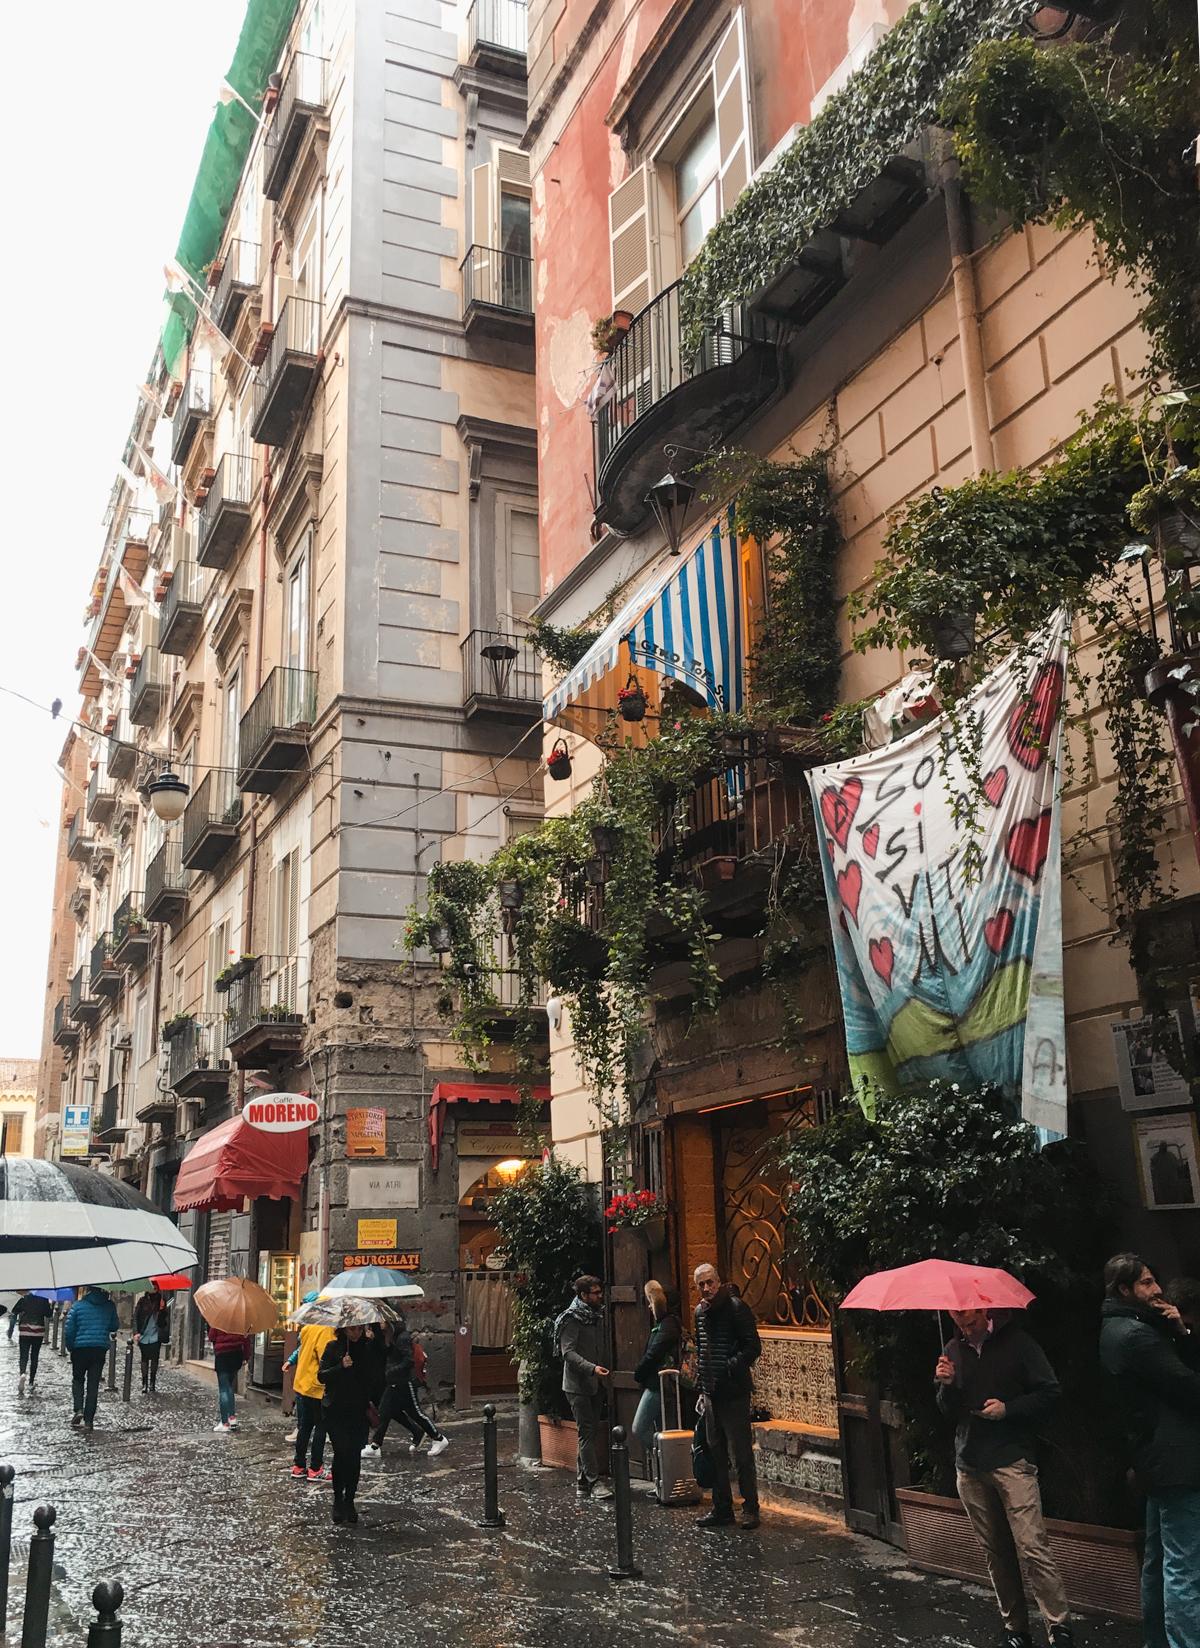 Gluten Free Pizza in Naples